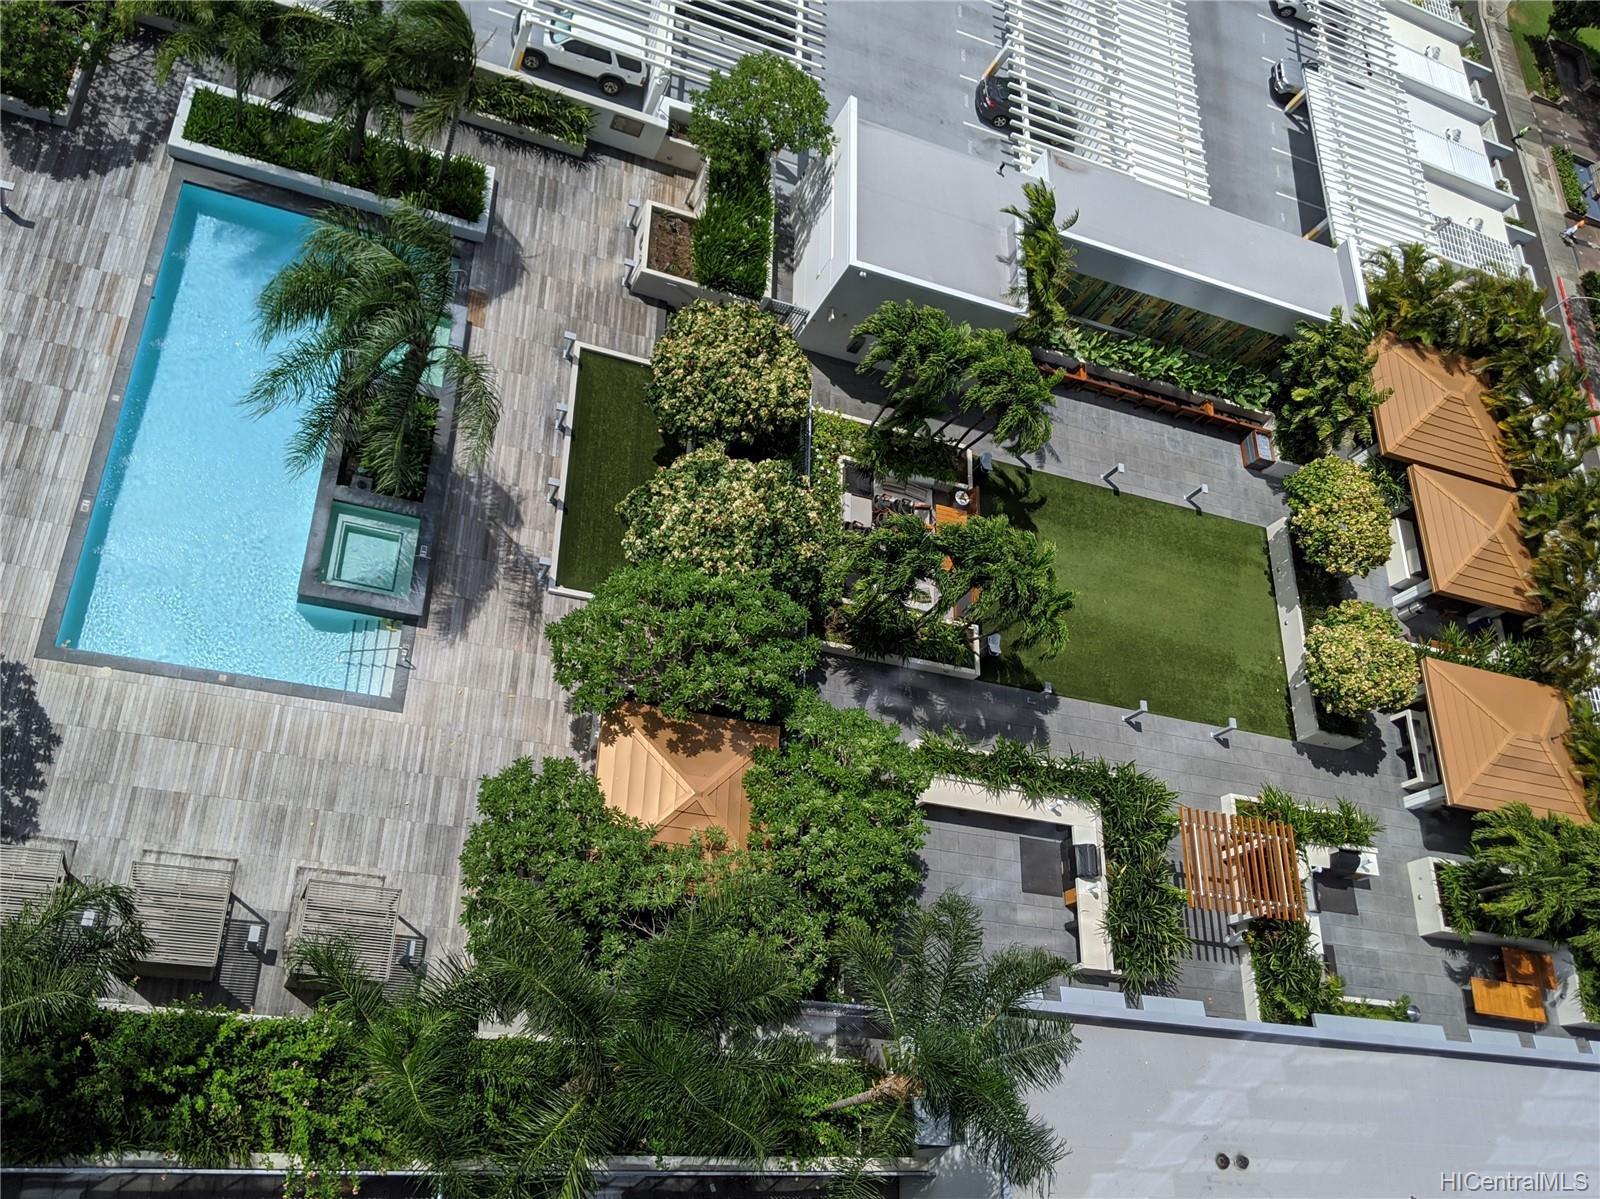 600 Ala Moana Blvd Honolulu - Rental - photo 19 of 25